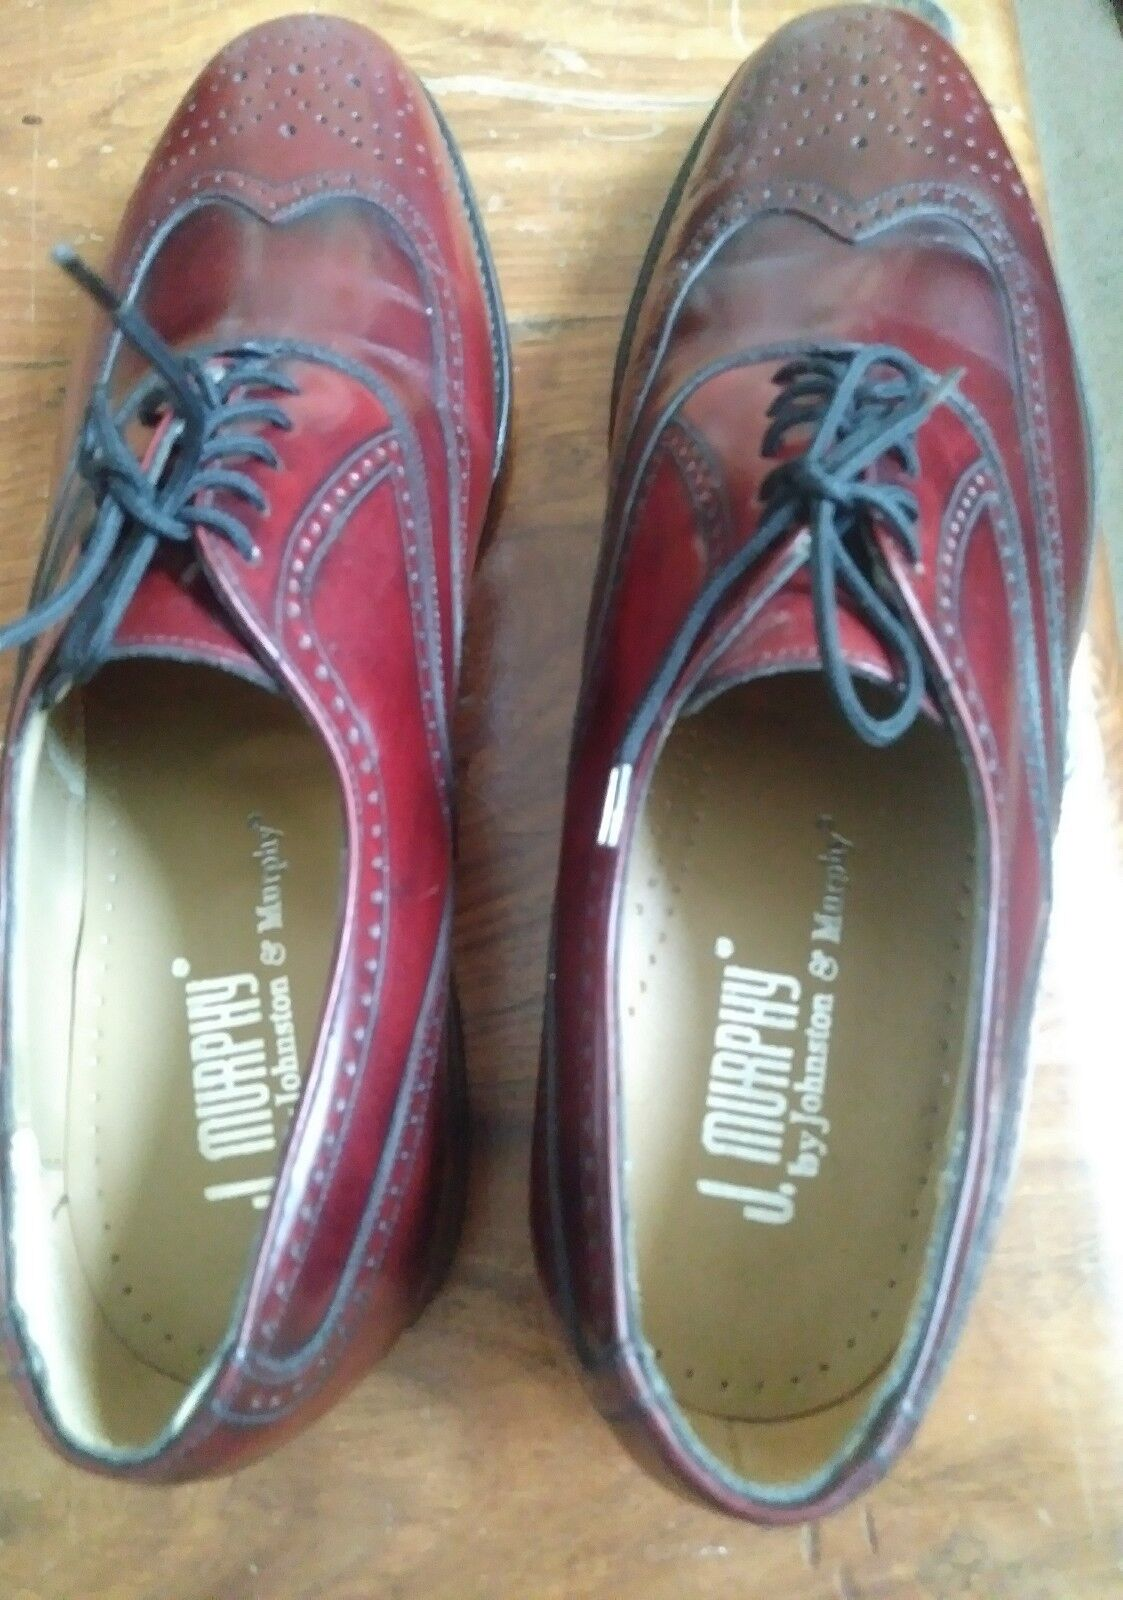 J. Murphy By Johnston Murphy Men's Burgundy Wingtip Oxfords Oxfords Oxfords dress scarpe 7 M 665459